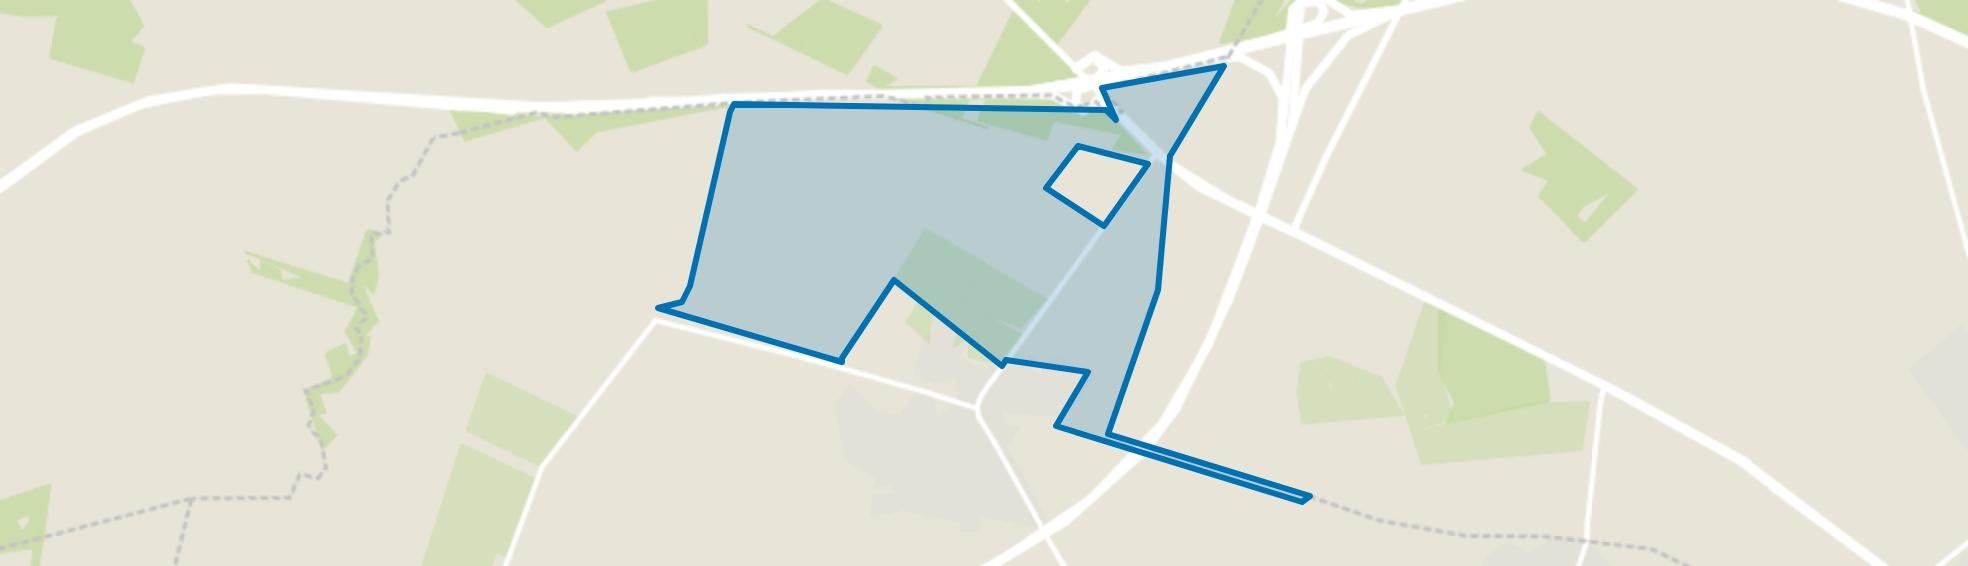 Reijers-Camp, Wolfheze map